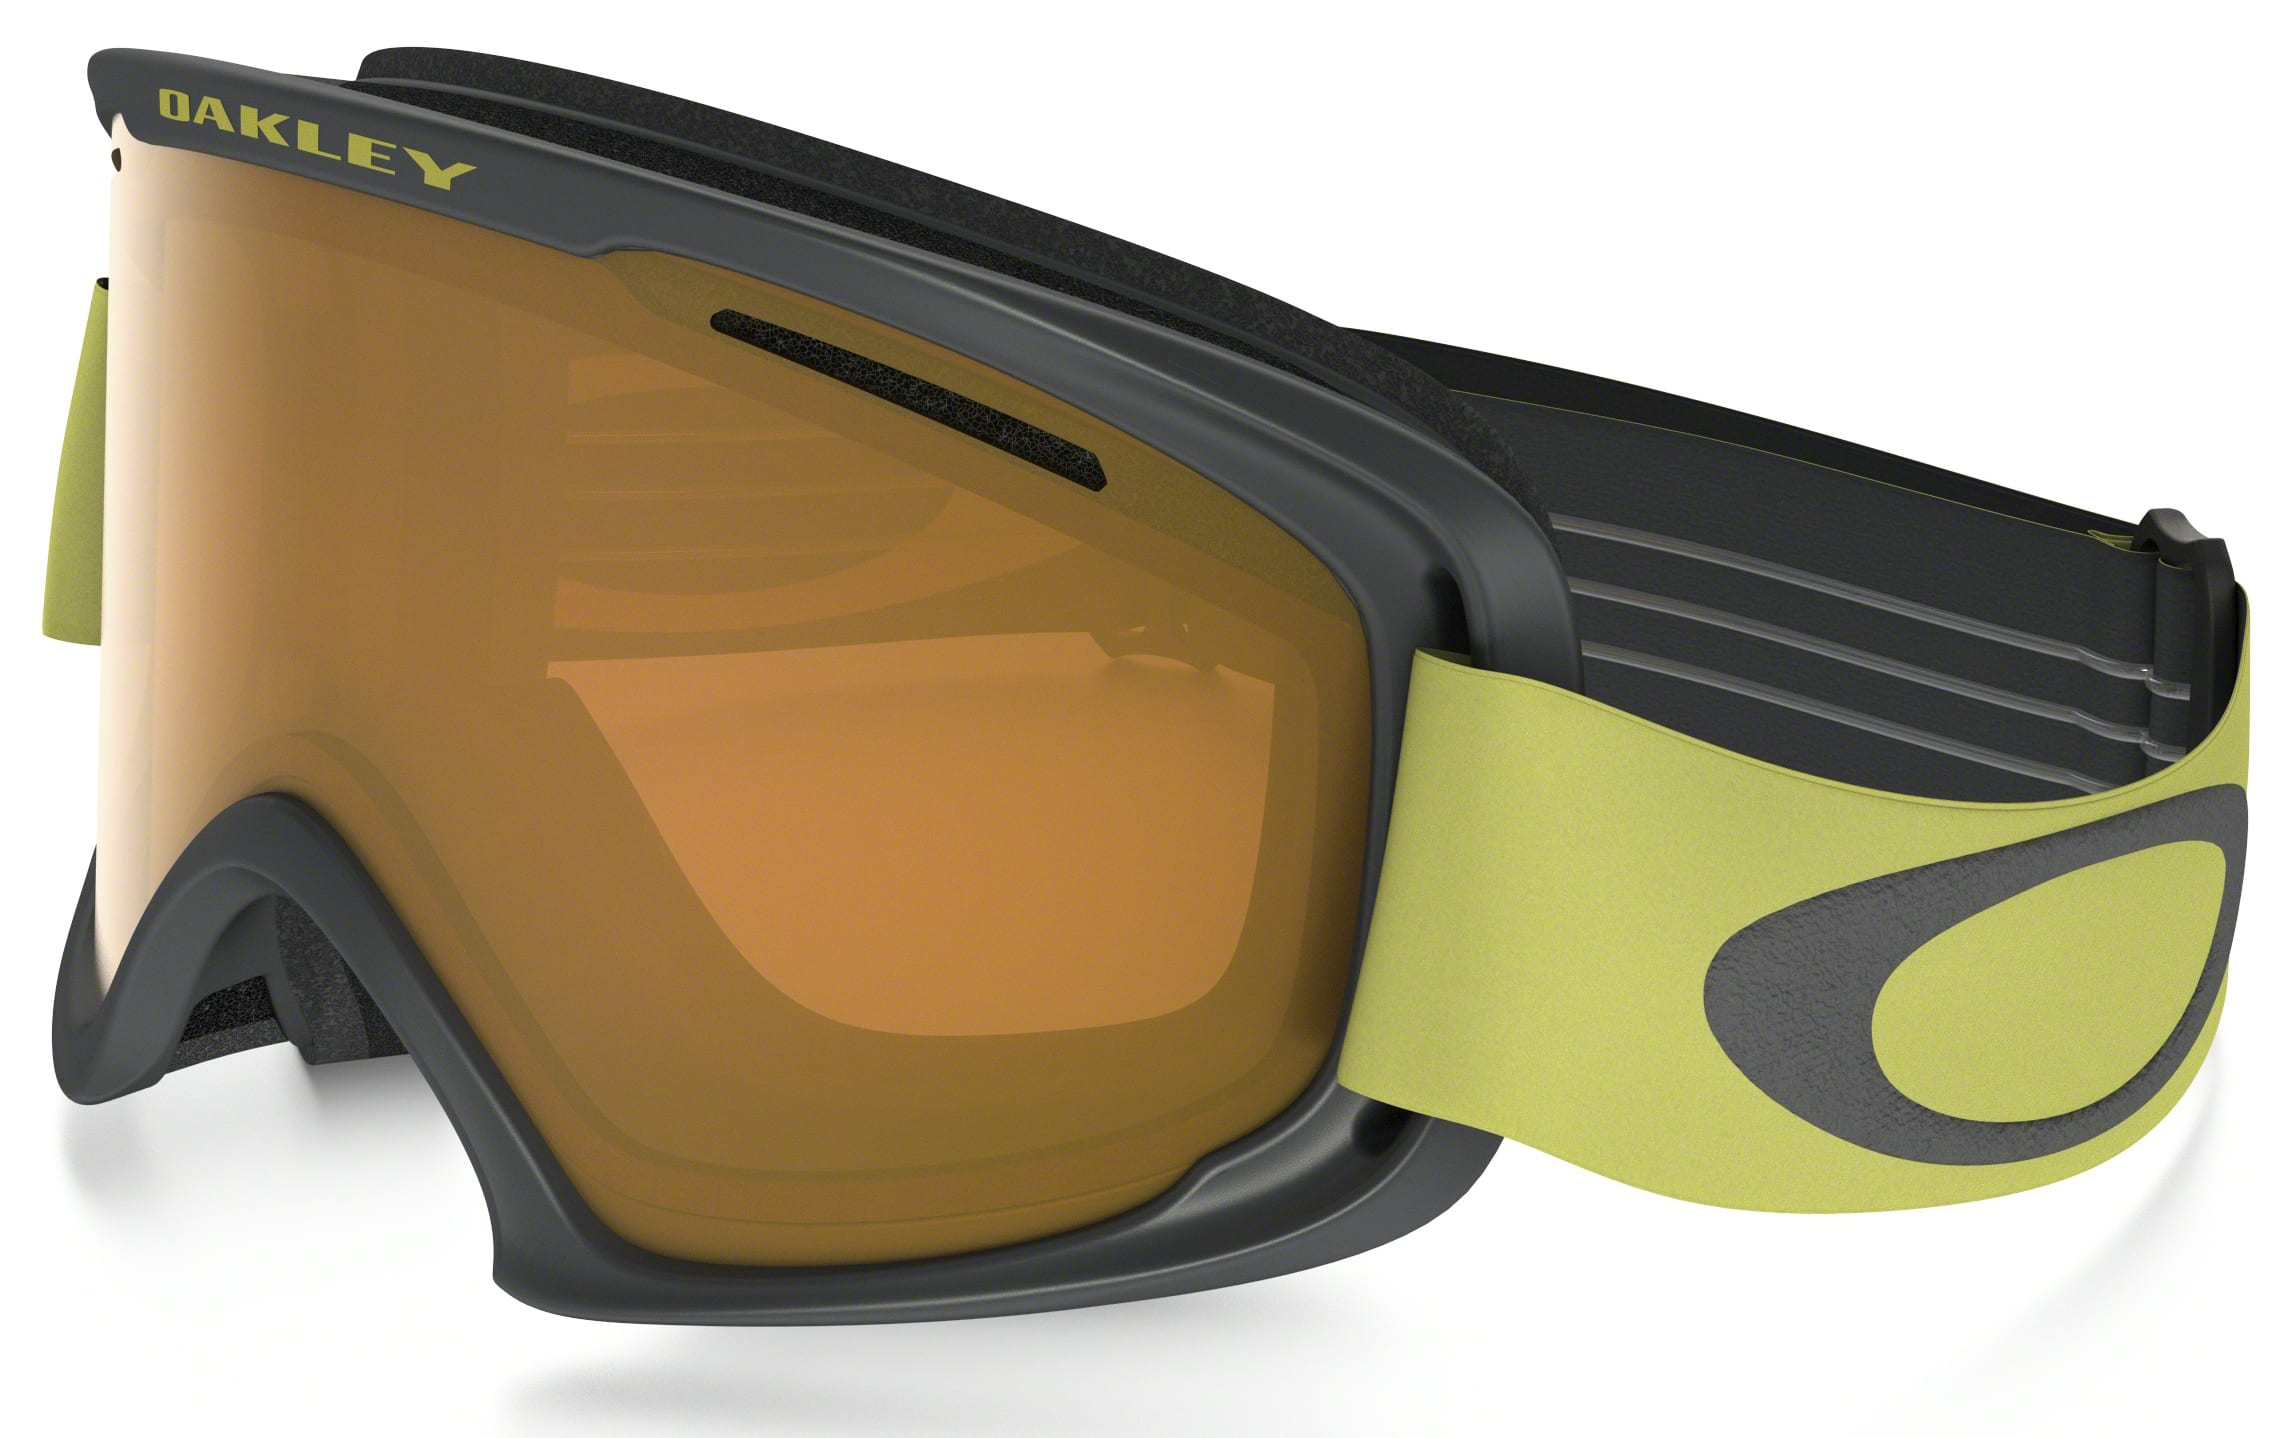 6d58f86847cf Oakley O2 Goggles Review « Heritage Malta